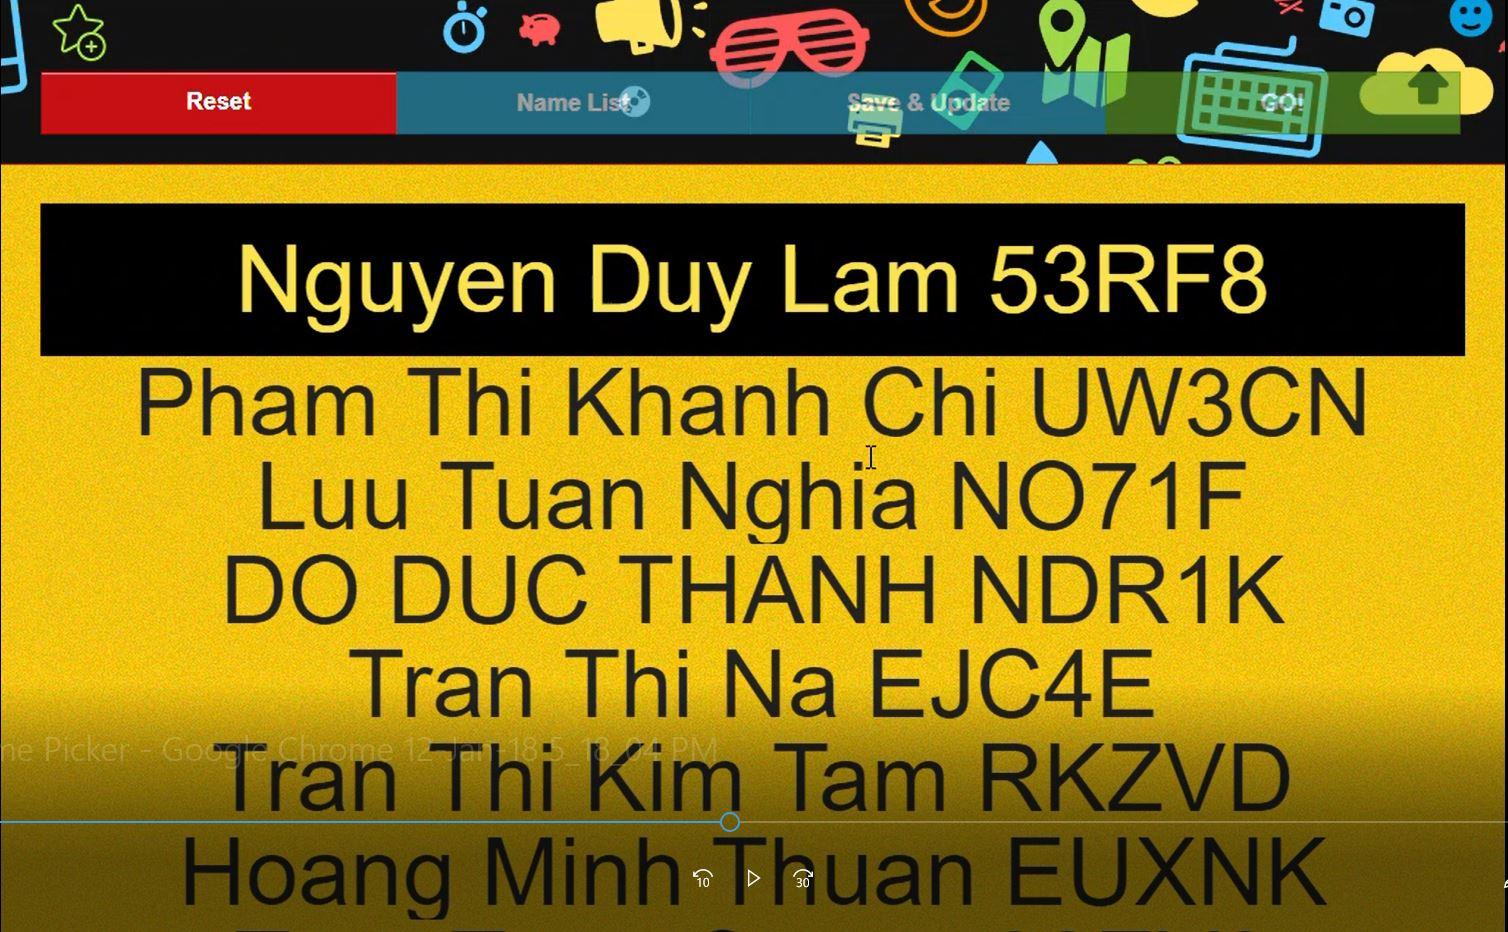 Nguyen Duy Lam